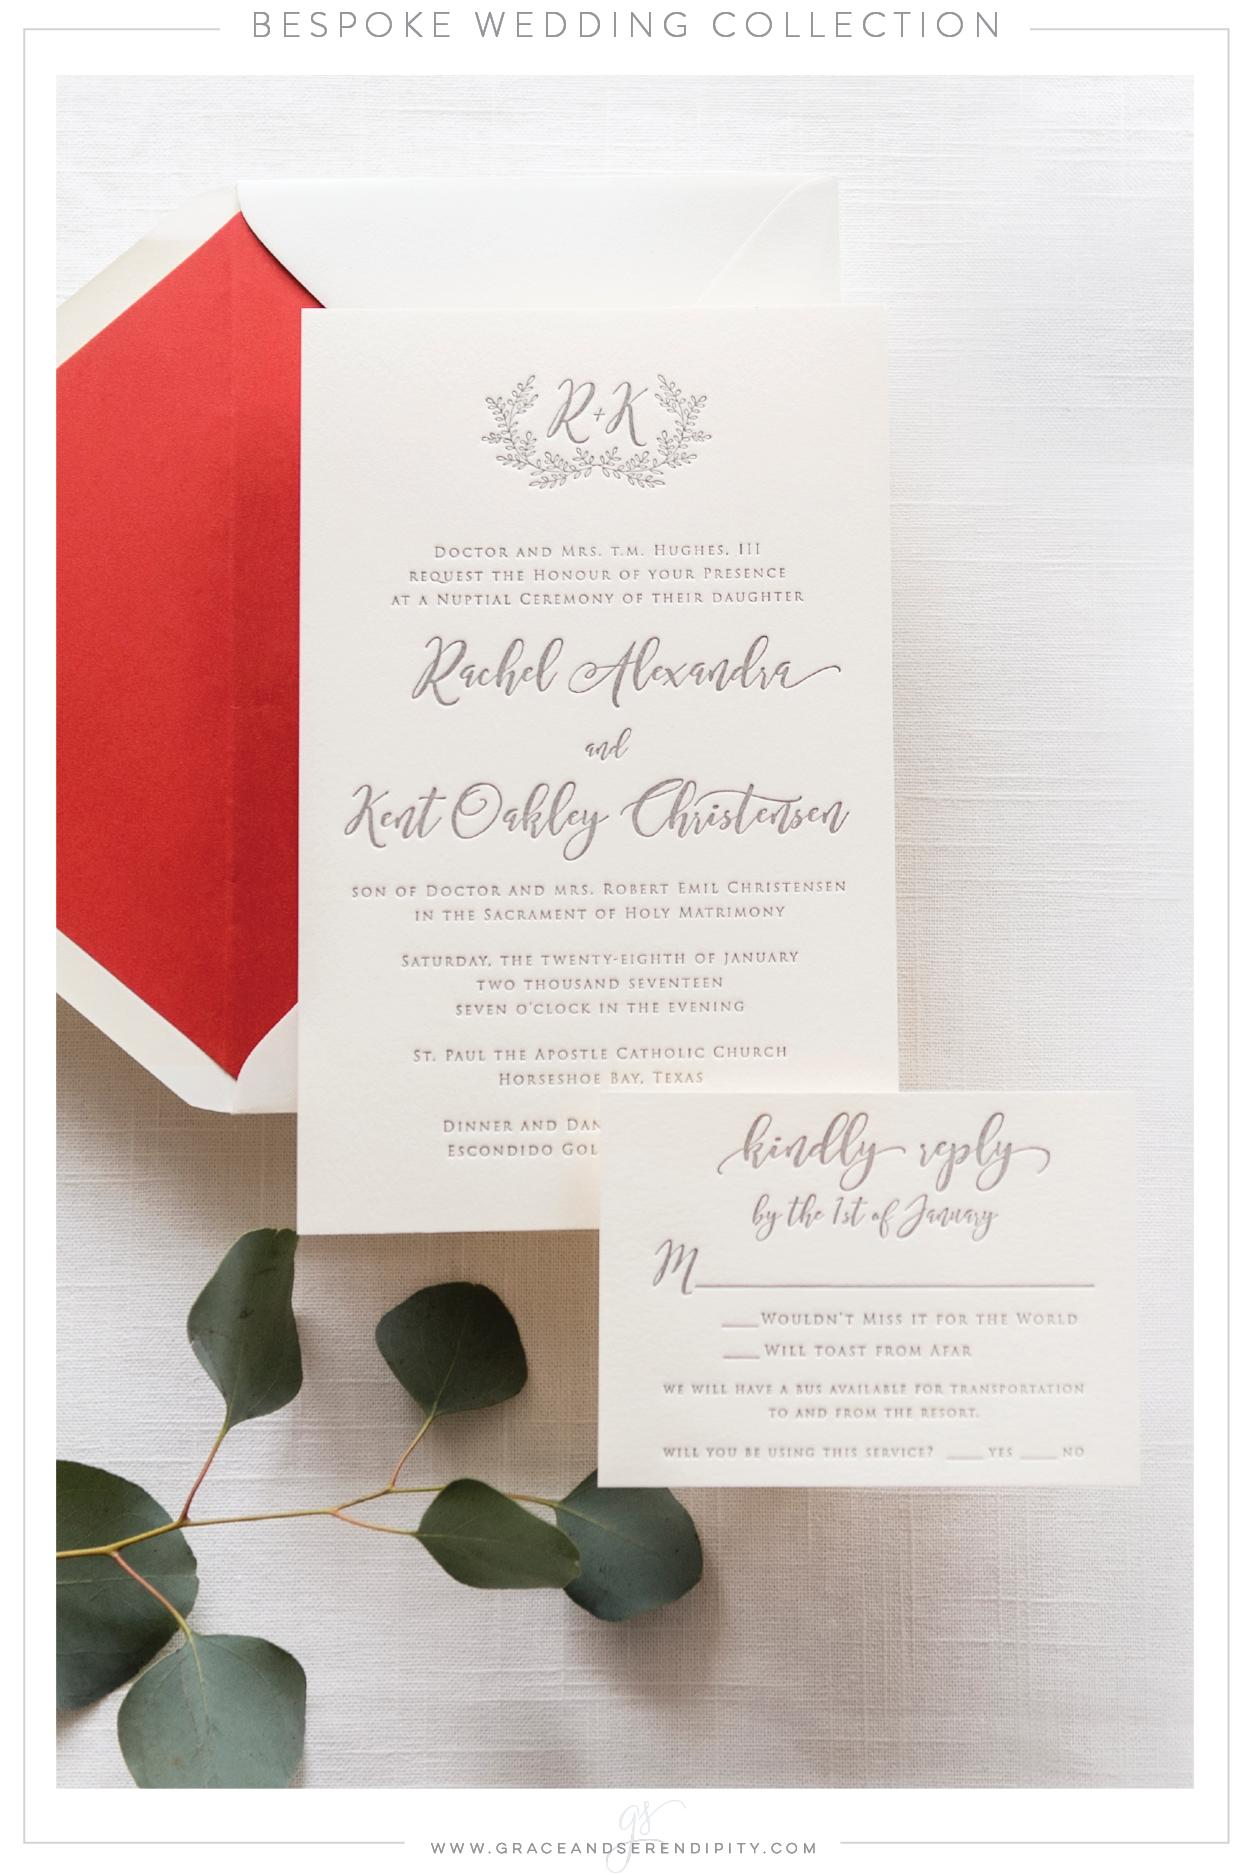 Custom Letterpress Wedding Invitation by Grace and Serendipity ...